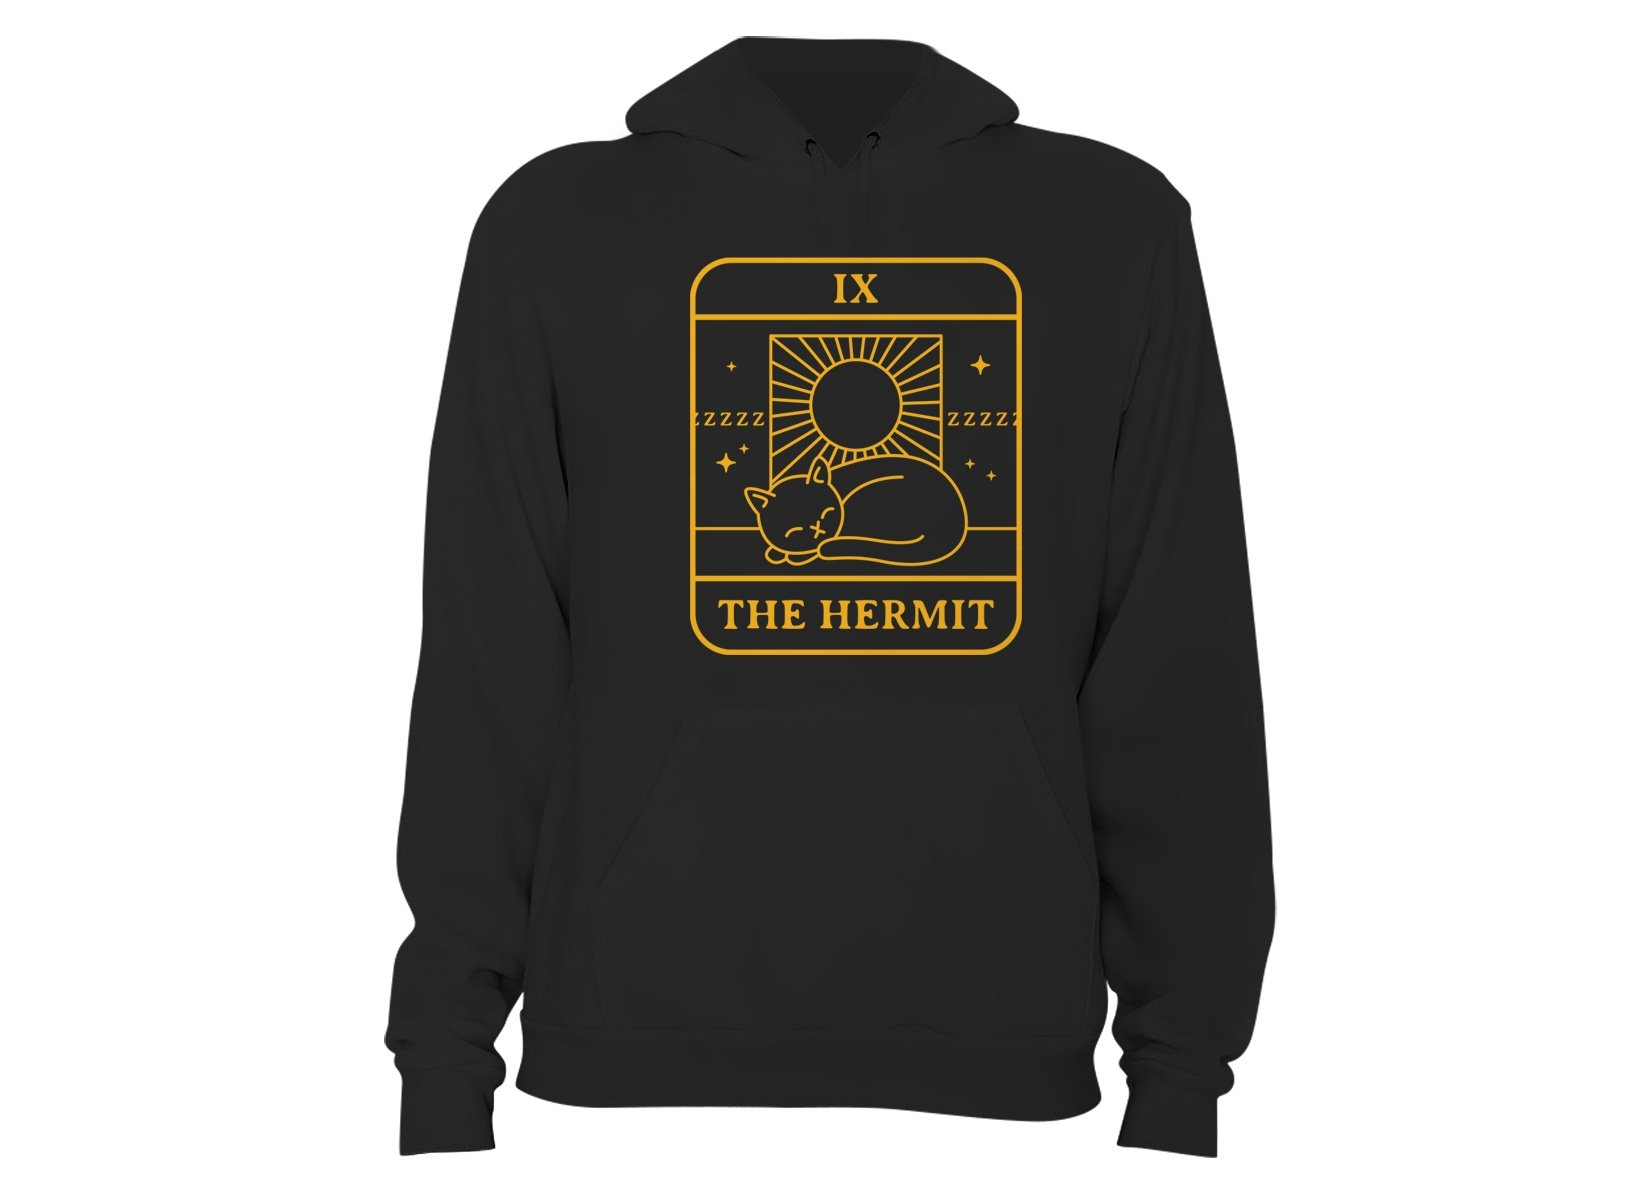 The Hermit on Hoodie